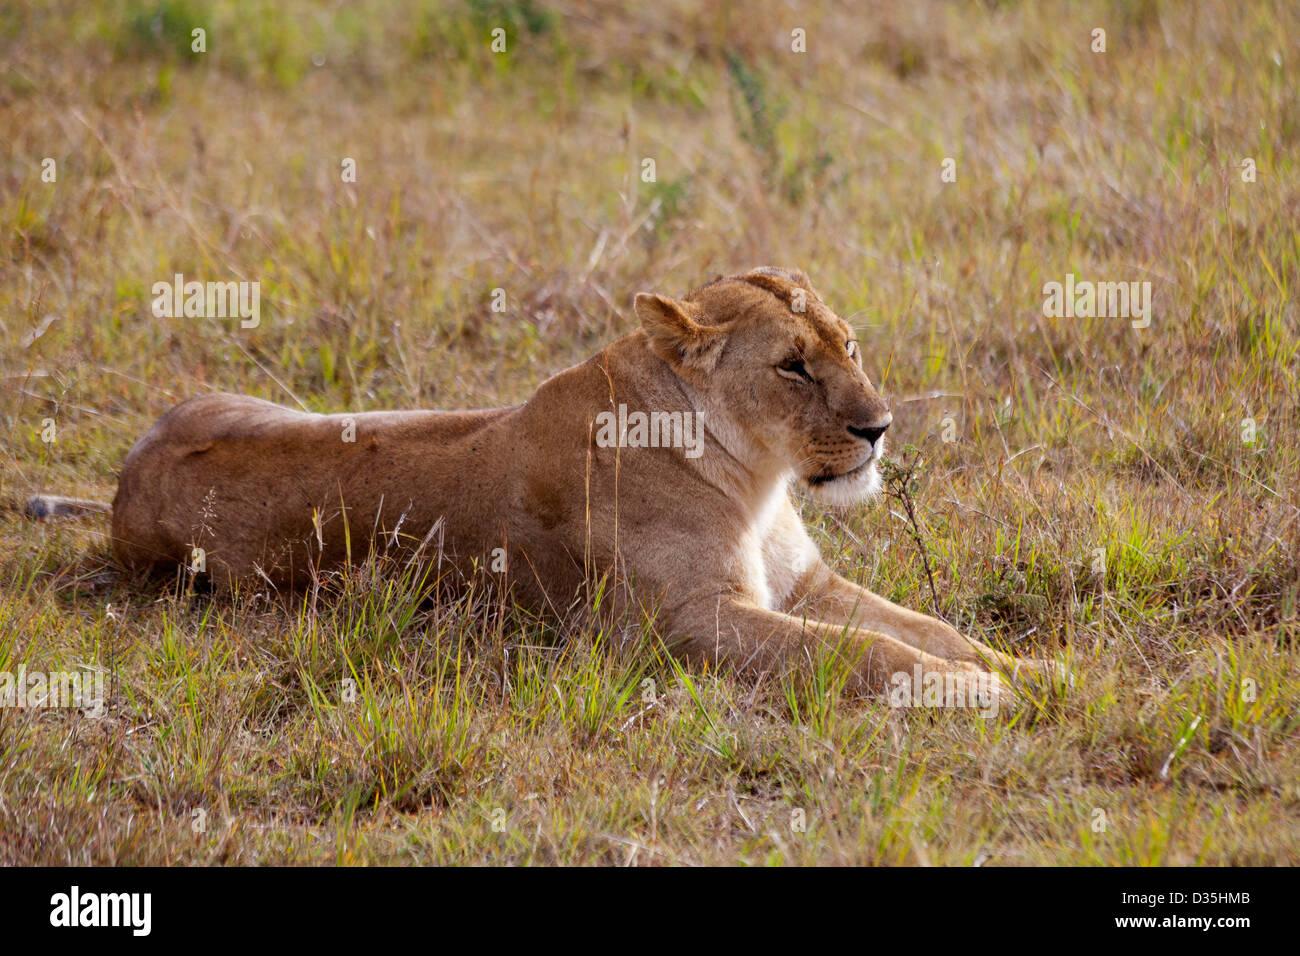 Lioness, Kenya Stock Photo